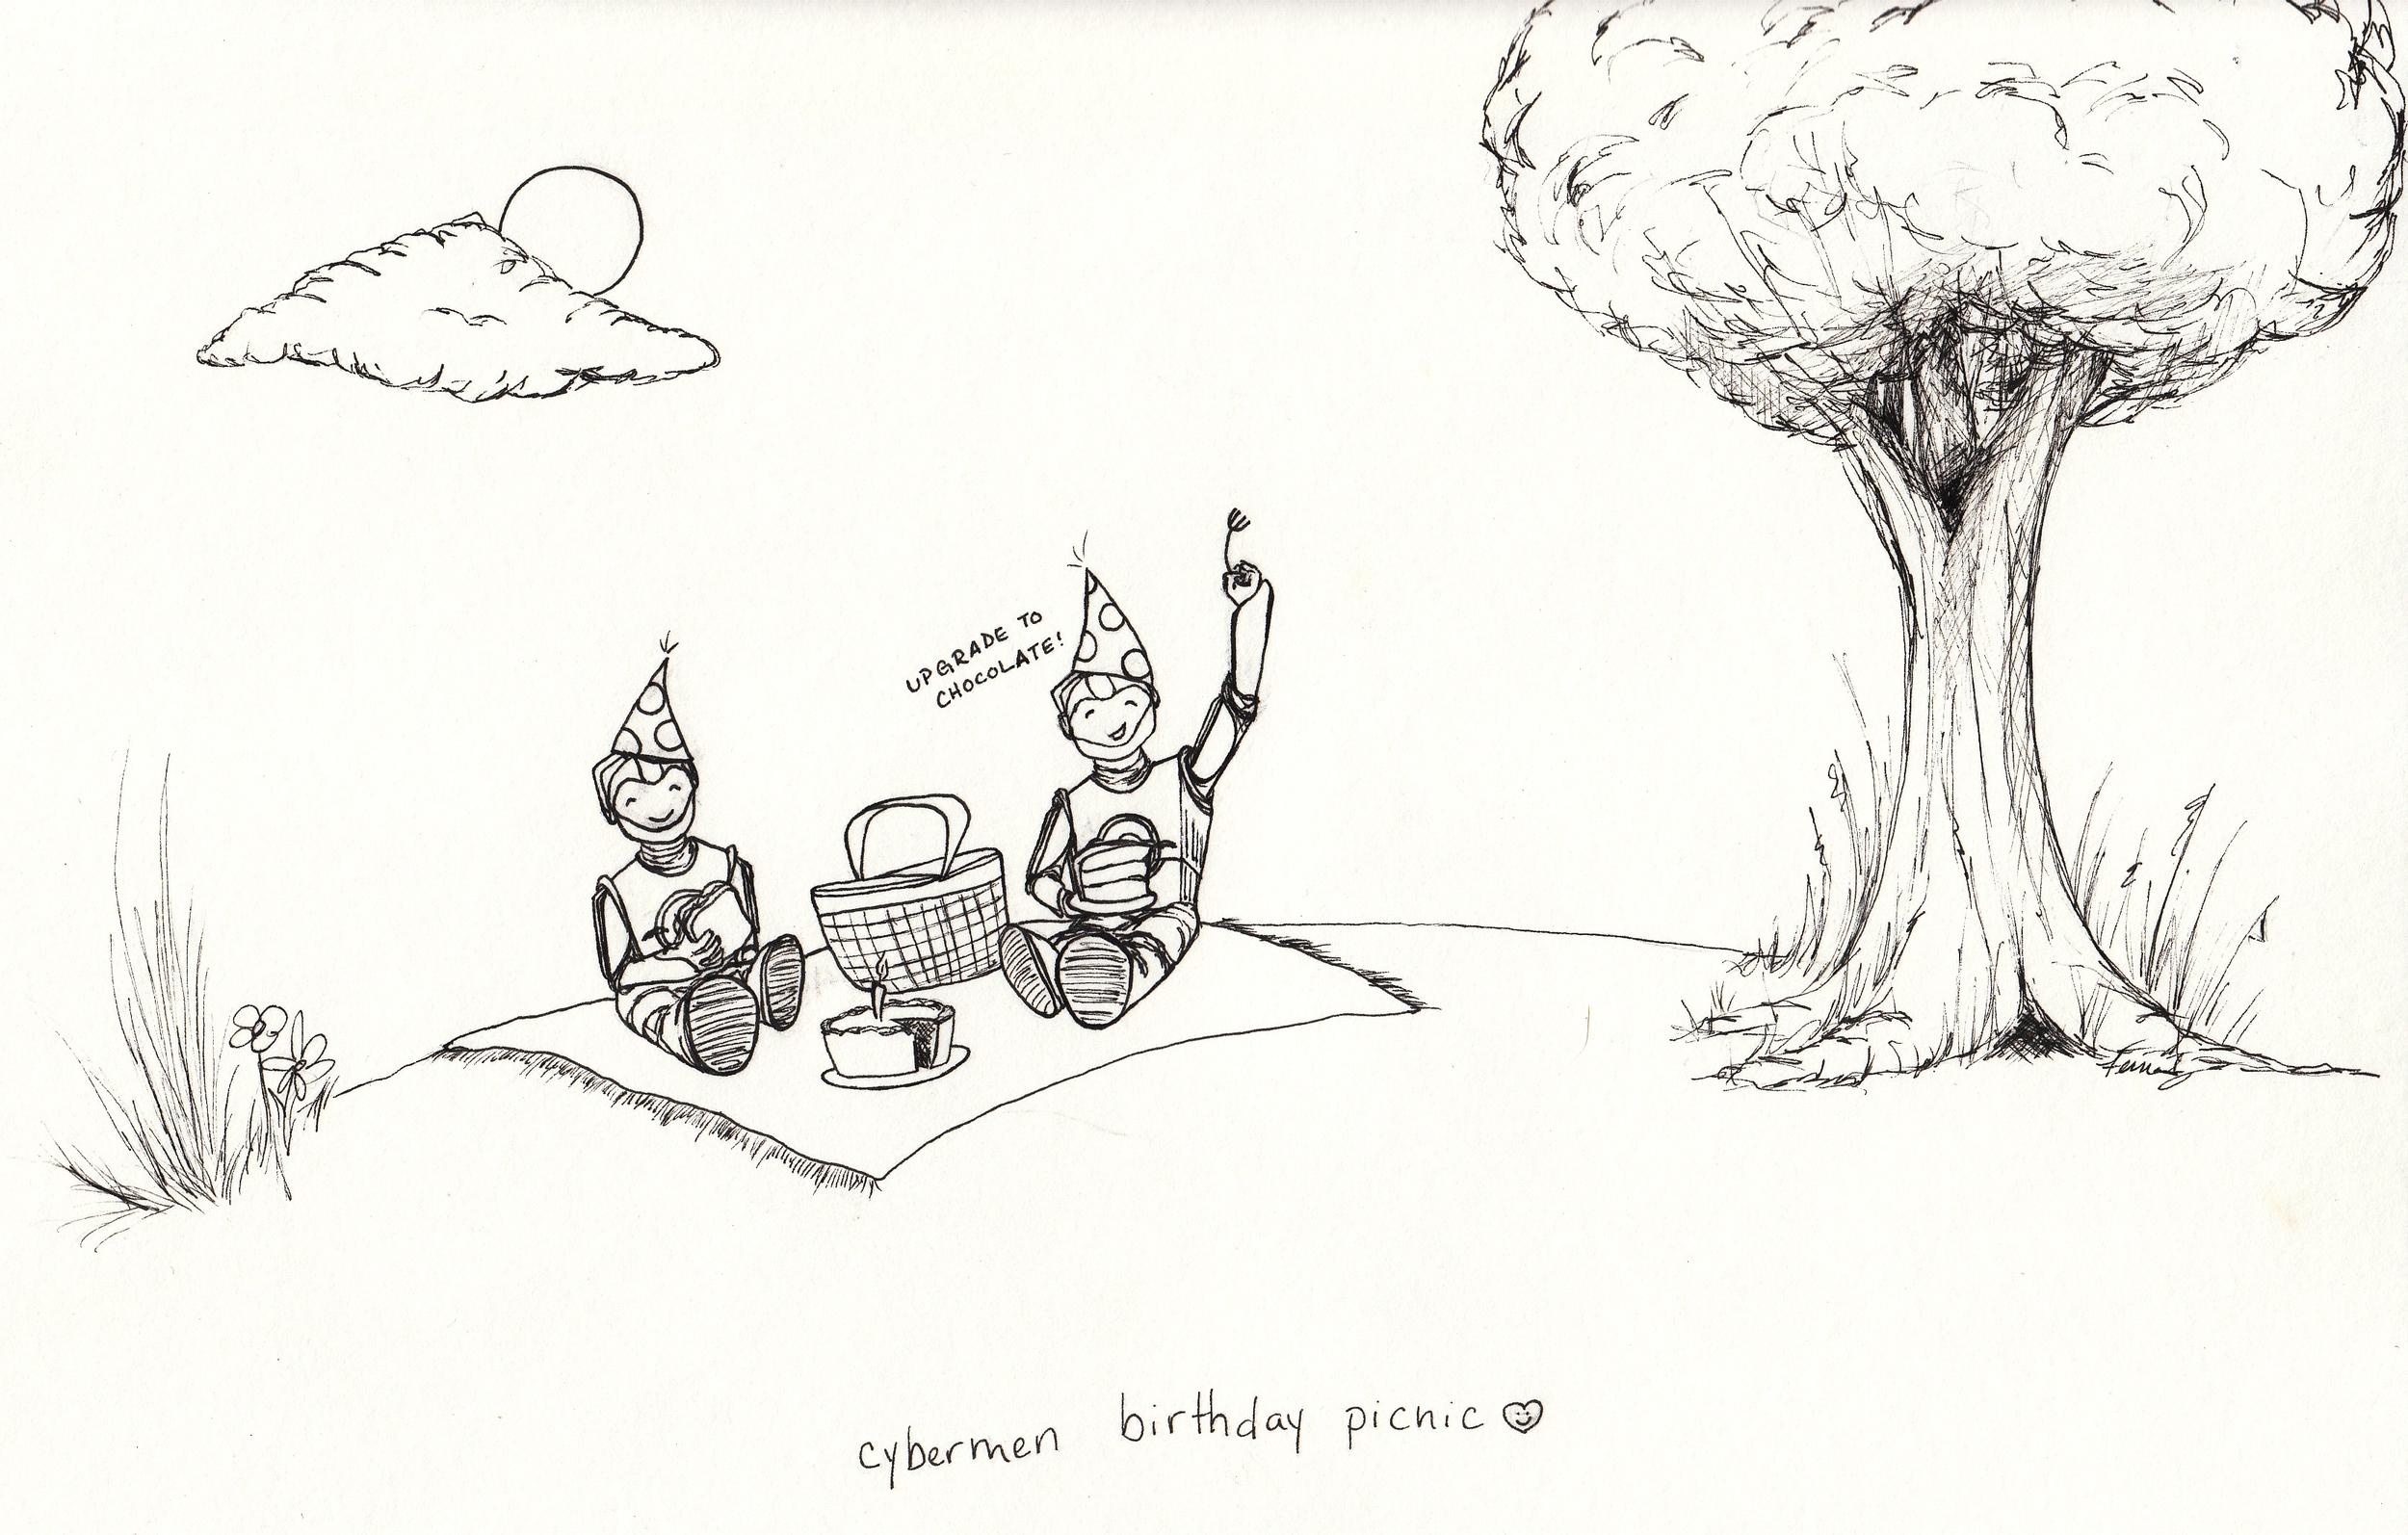 cybermen birthday picnic